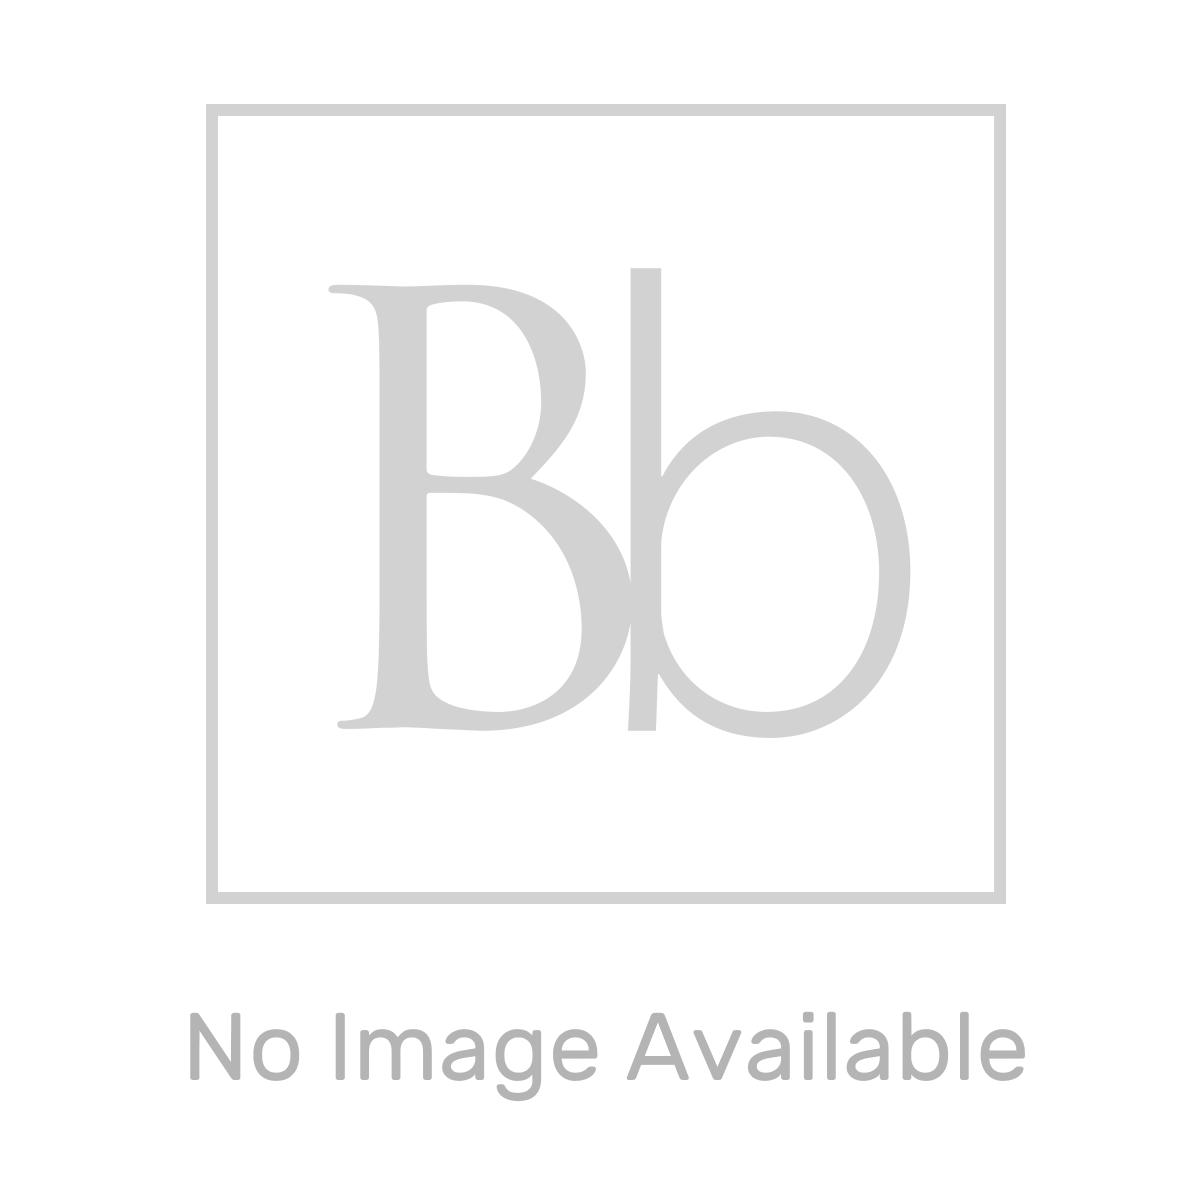 Nymas Concealed Dark Grey Doc M Shower Pack